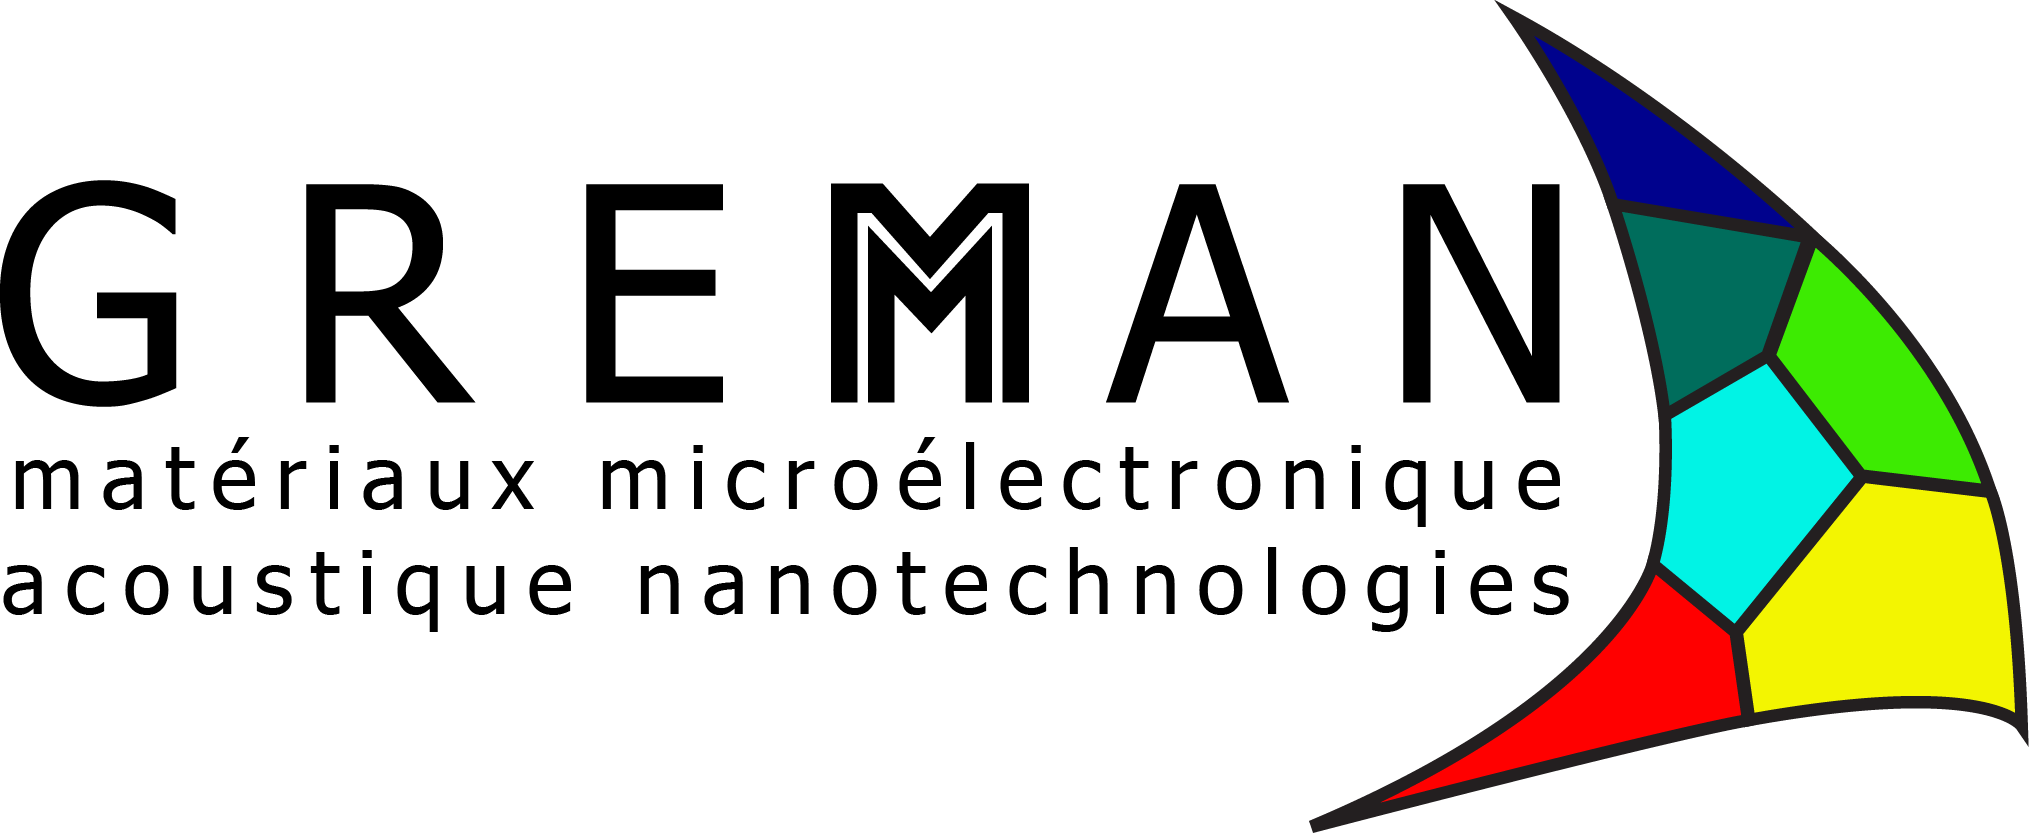 logo-greman